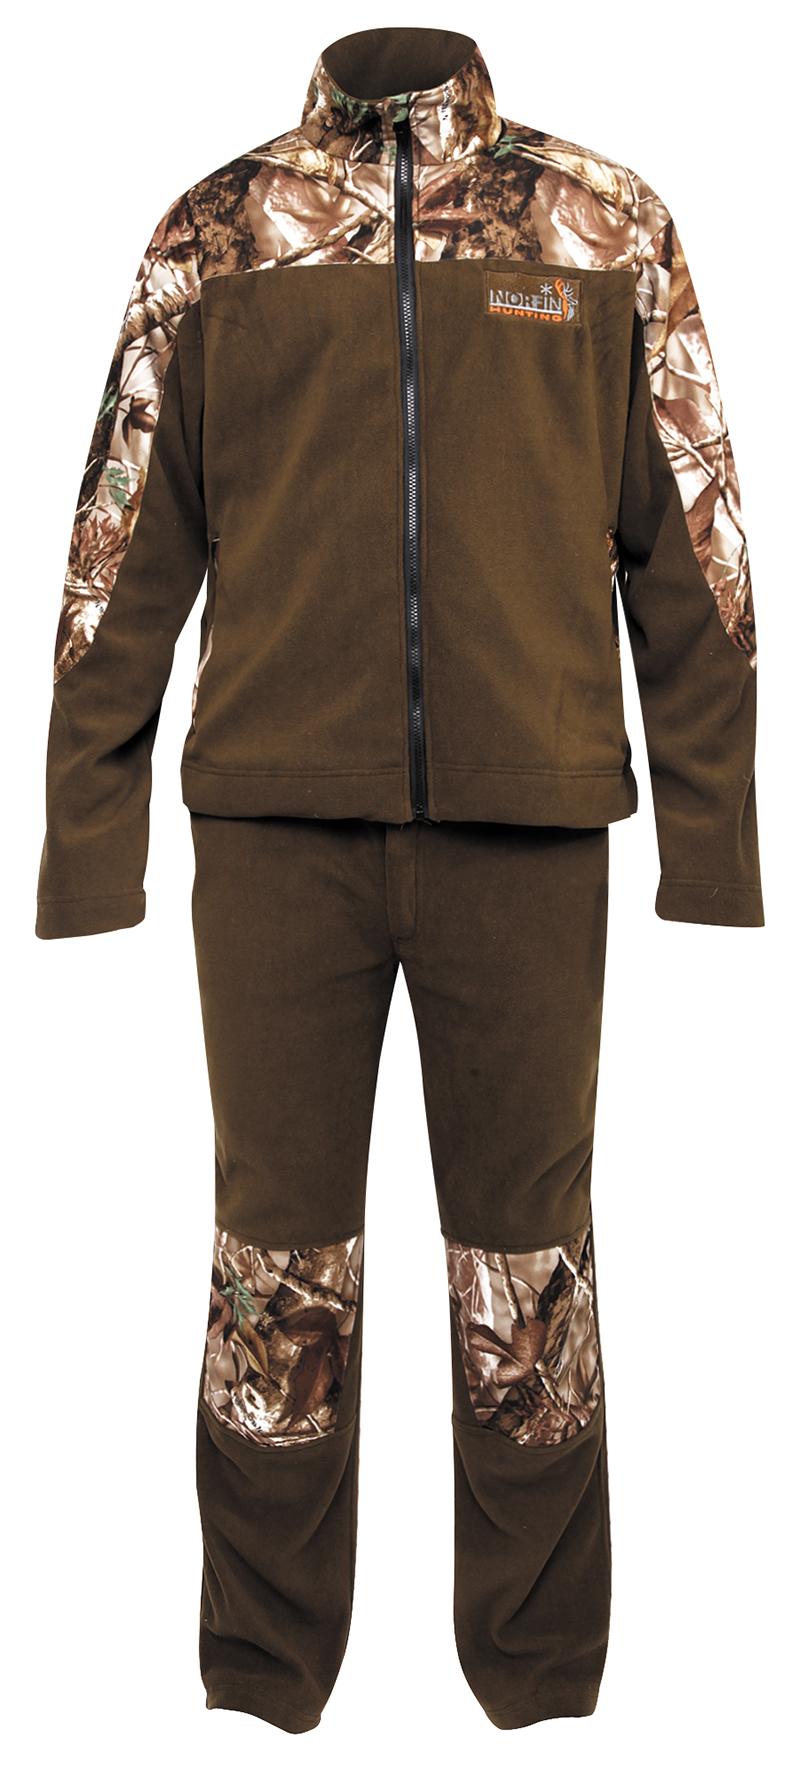 Спортивный костюм Norfin Hunting, forest, XXL INT фото